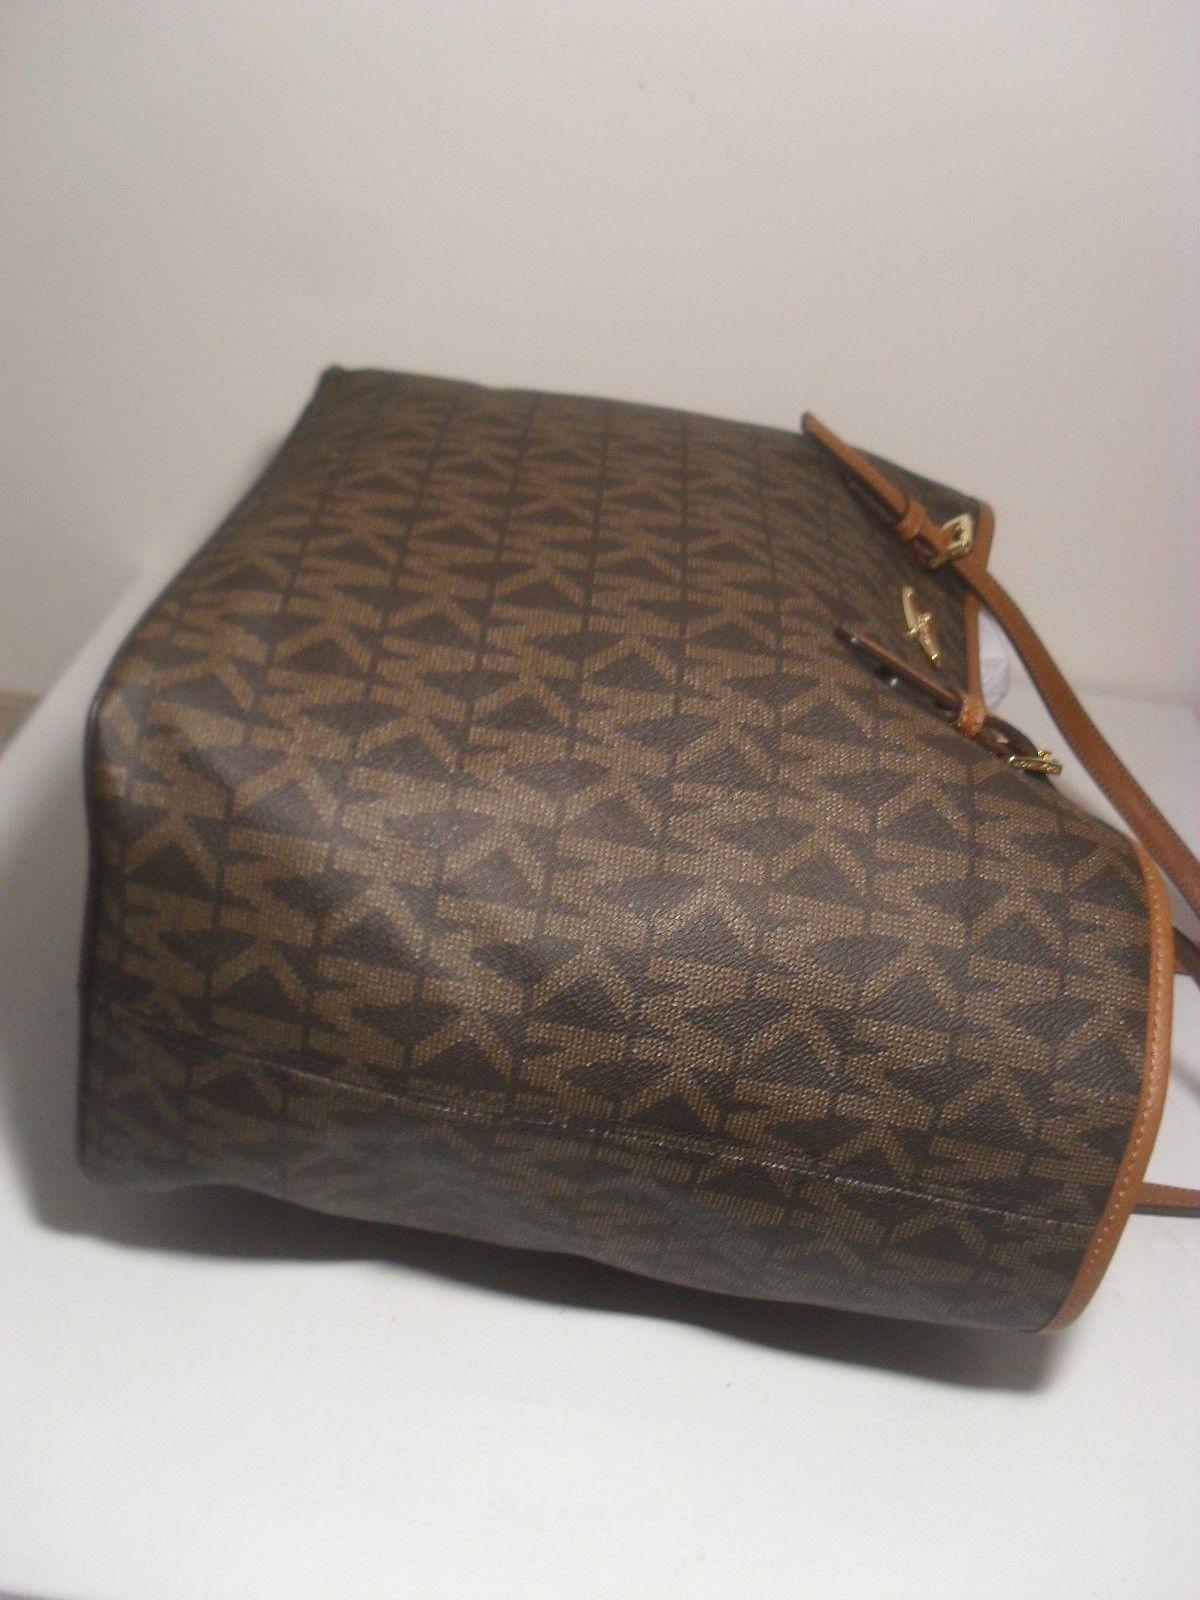 d3d578a9c2cd NWT Michael Kors Jet Set Brown MK Signature Carryall PVC Large Tote Shopper  Bag  127.55 https